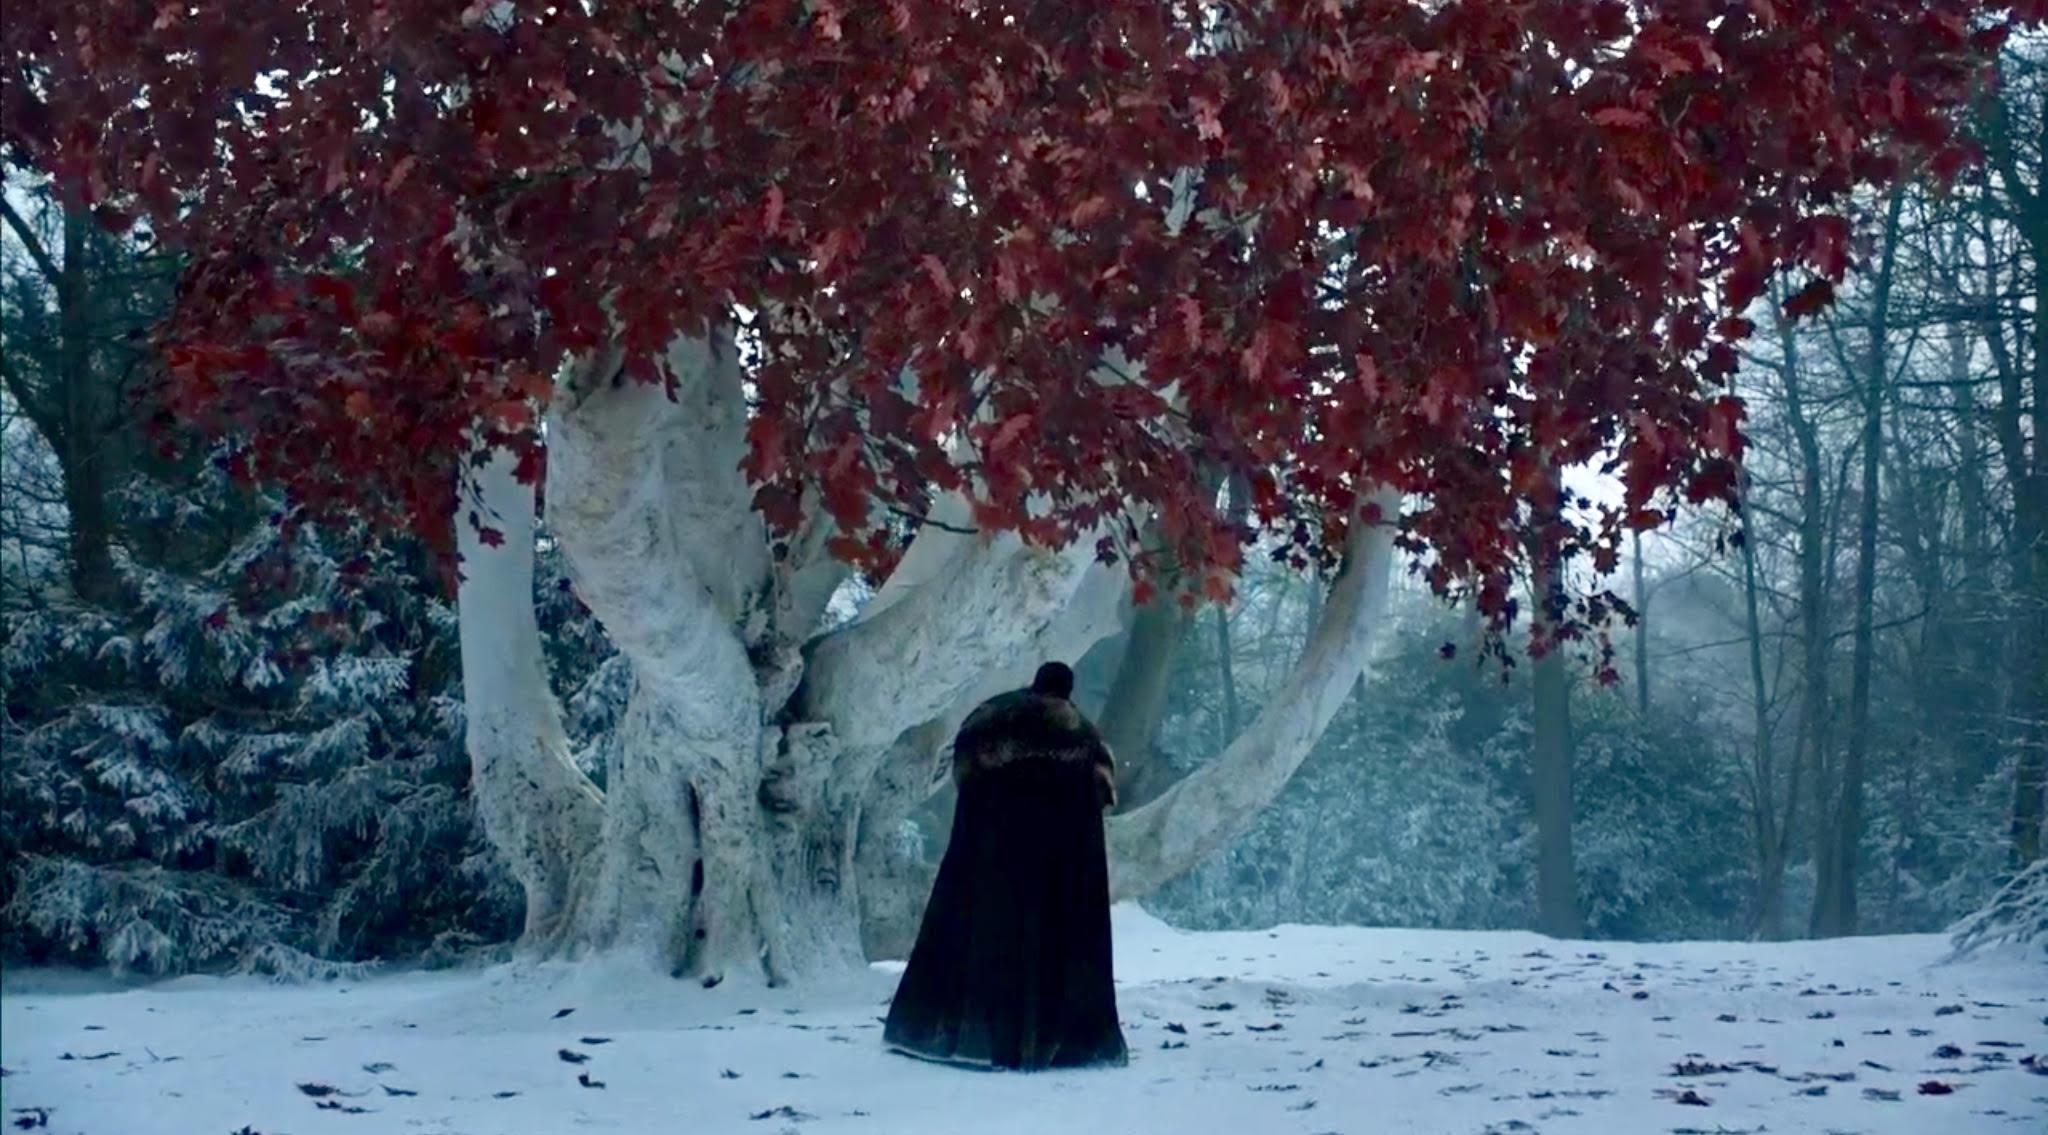 Game of Thrones' season 8: episode one 'Winterfell' recap